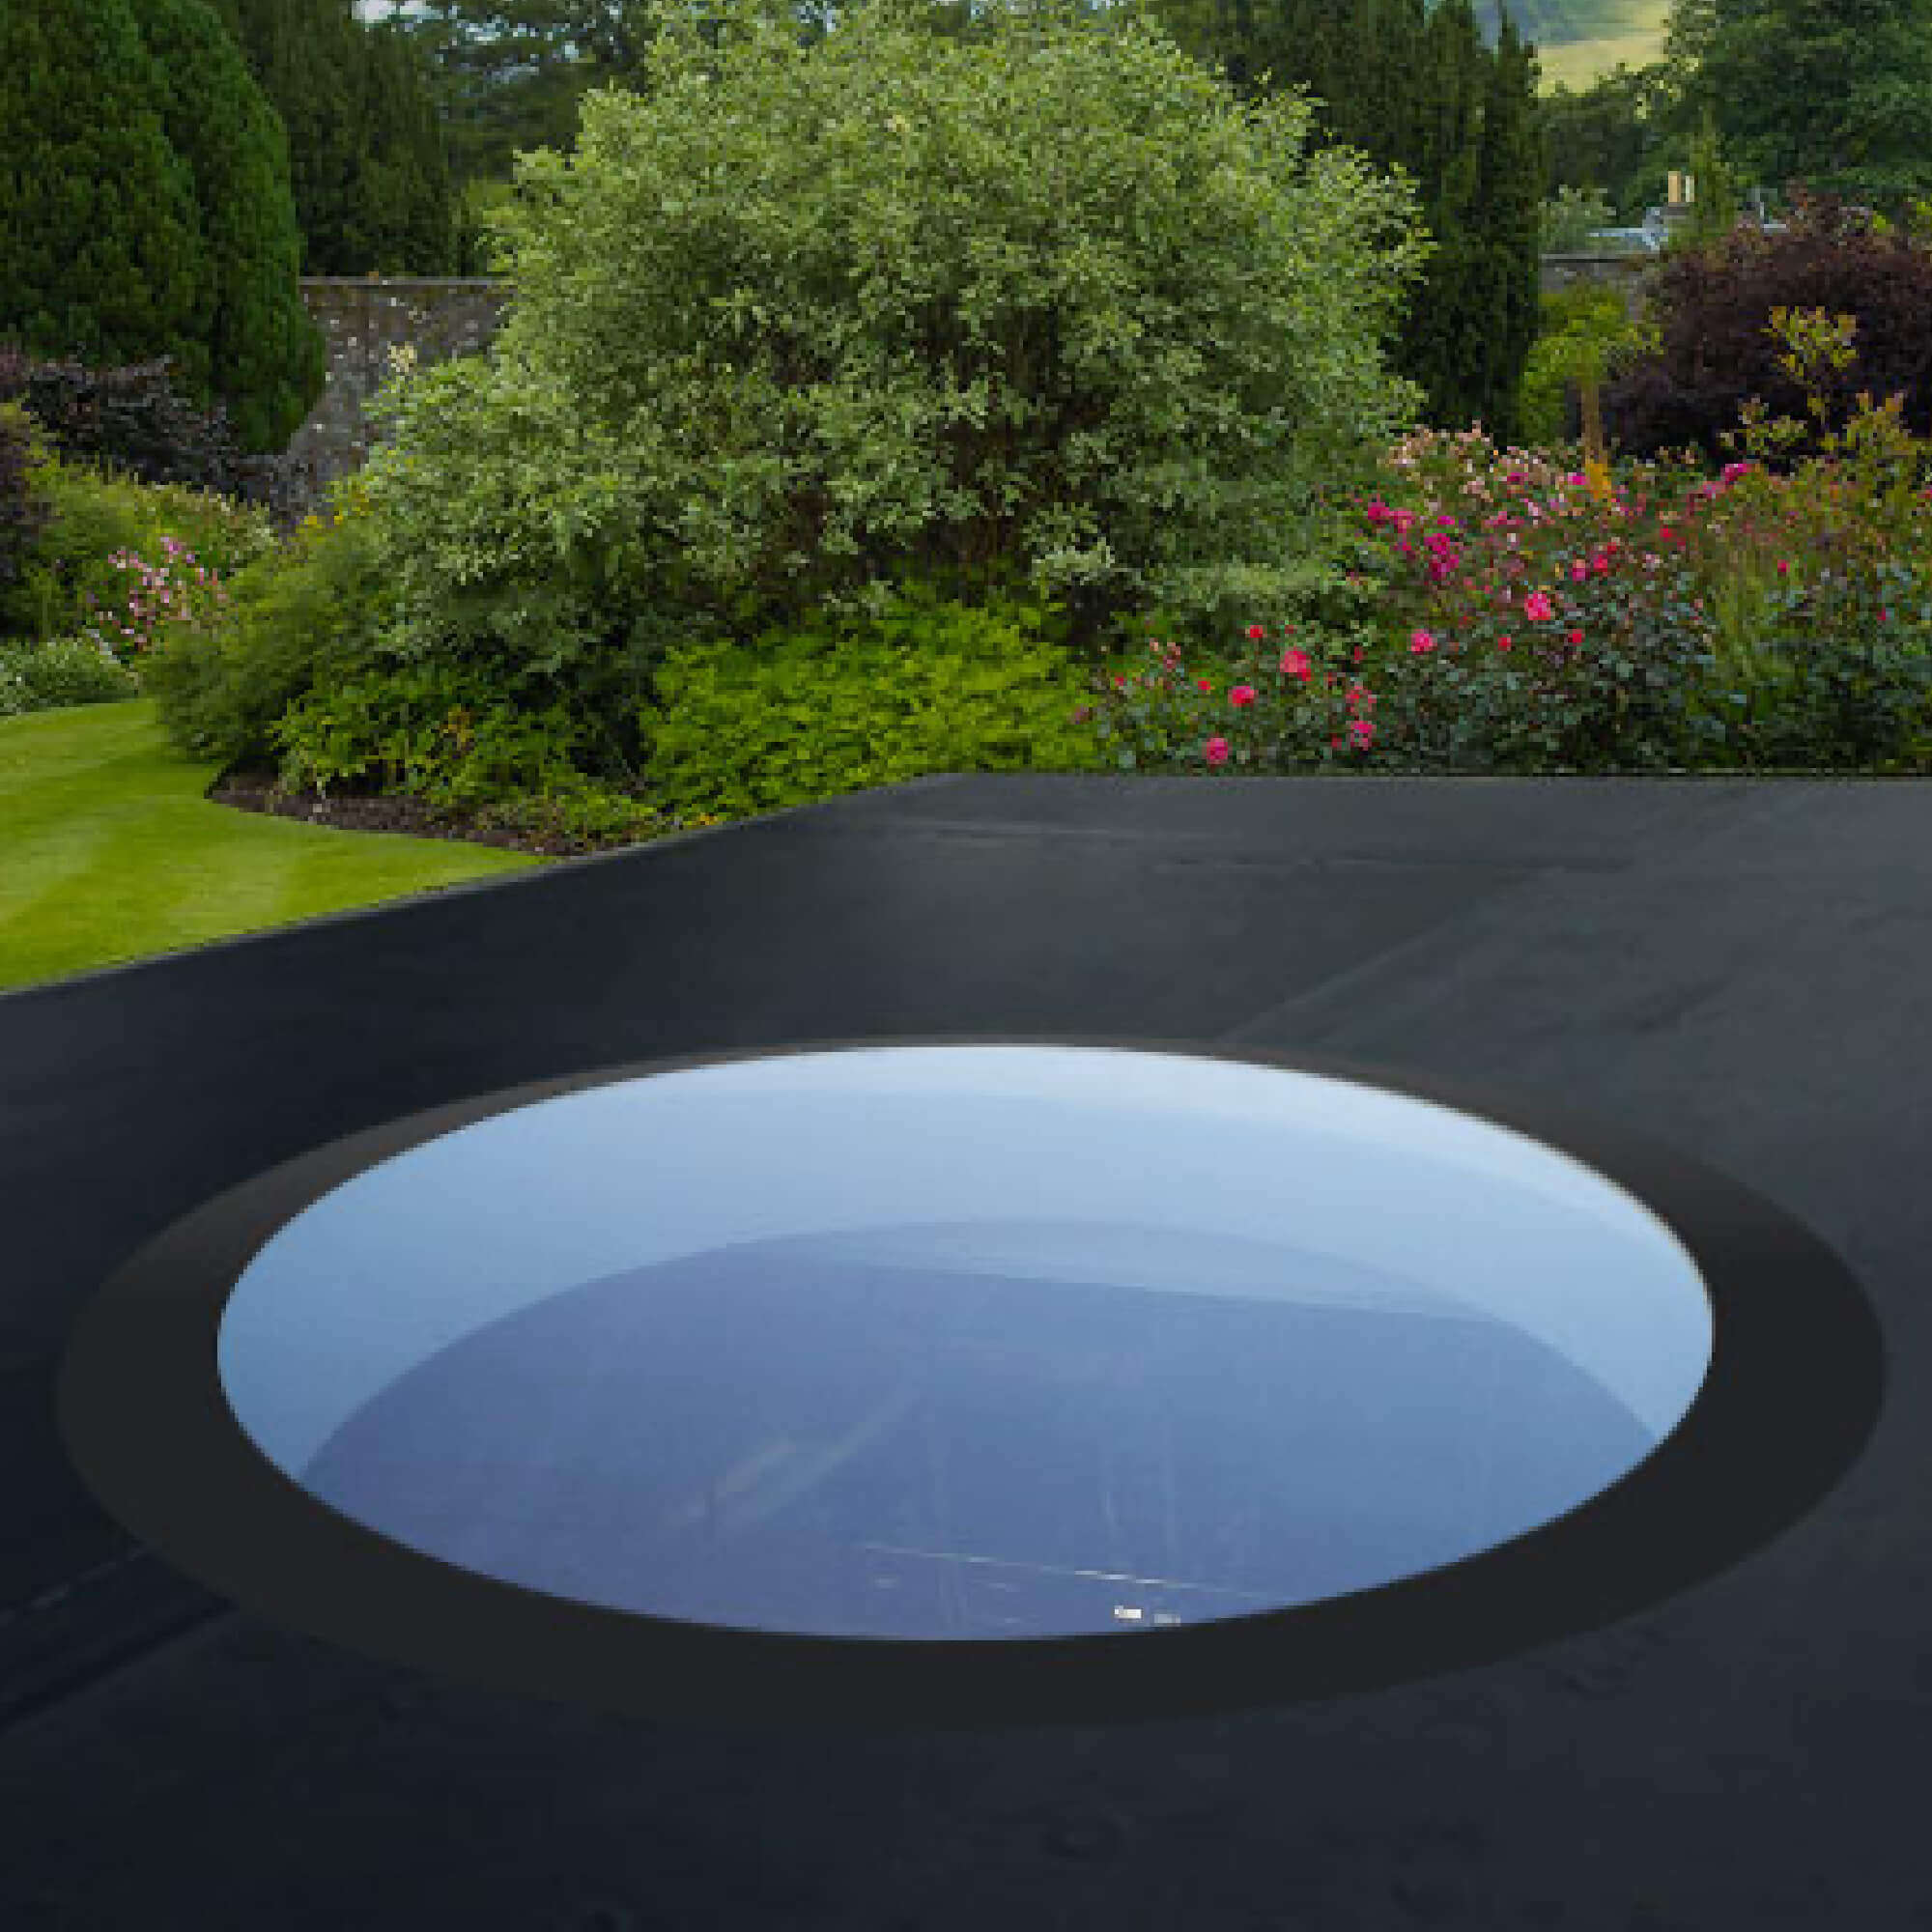 Flat Round Rooflight